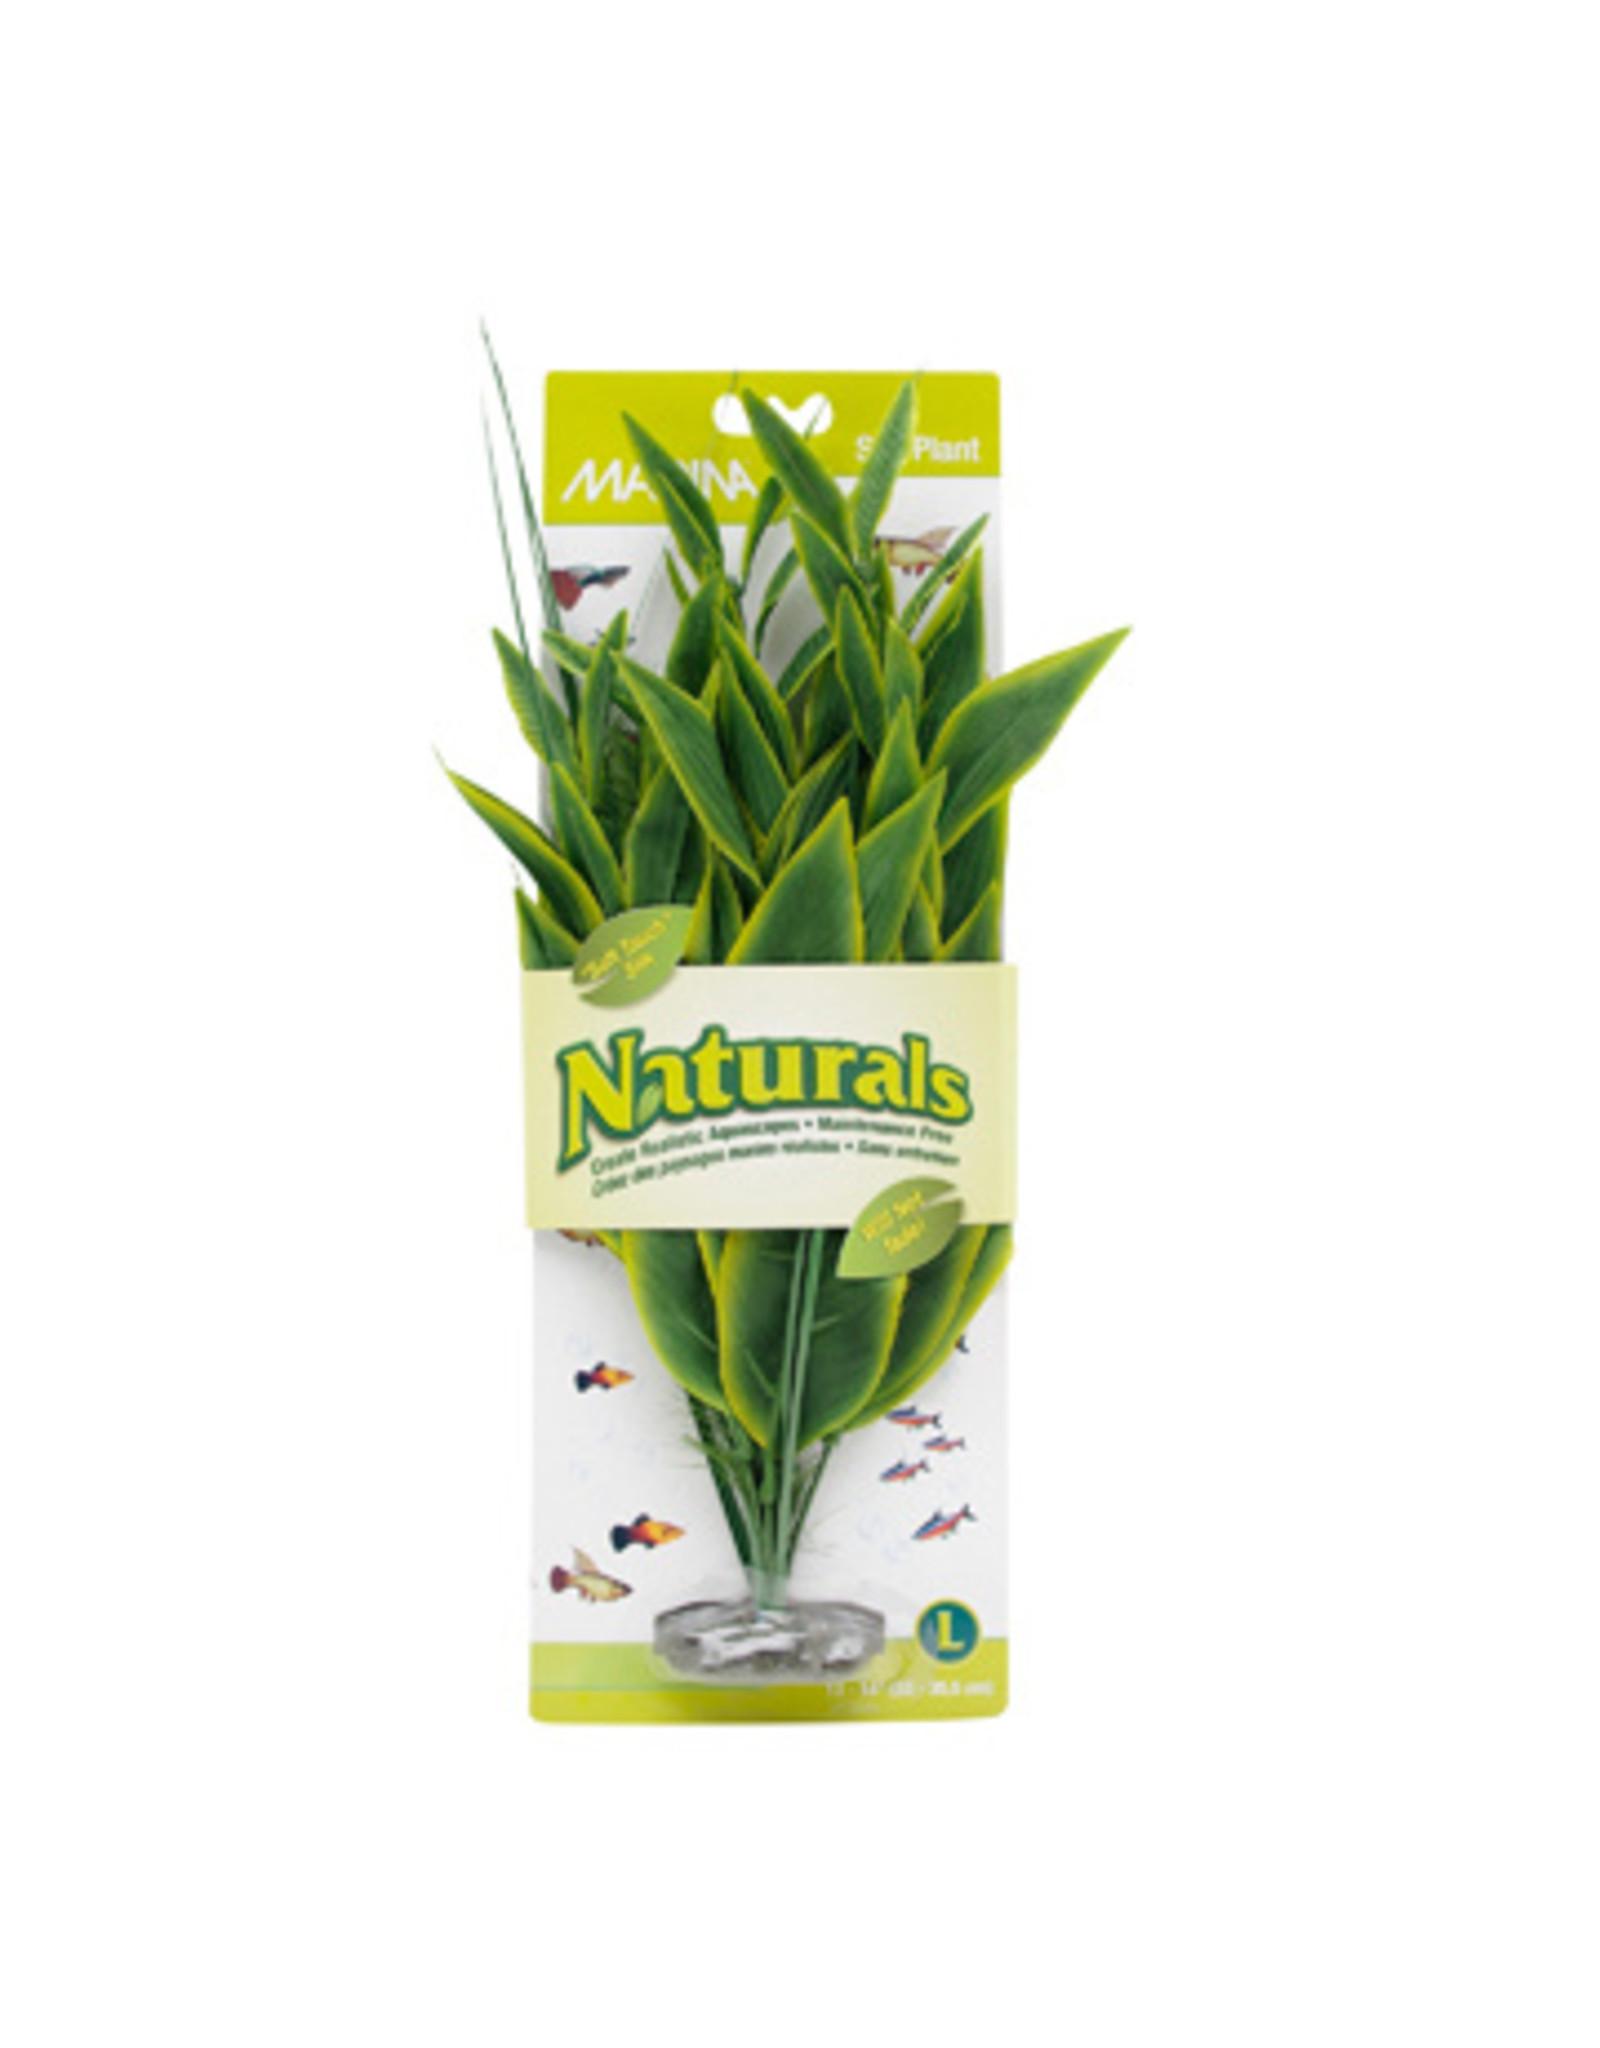 Marina MARINA Natural Green Dracena Silk Plant Large